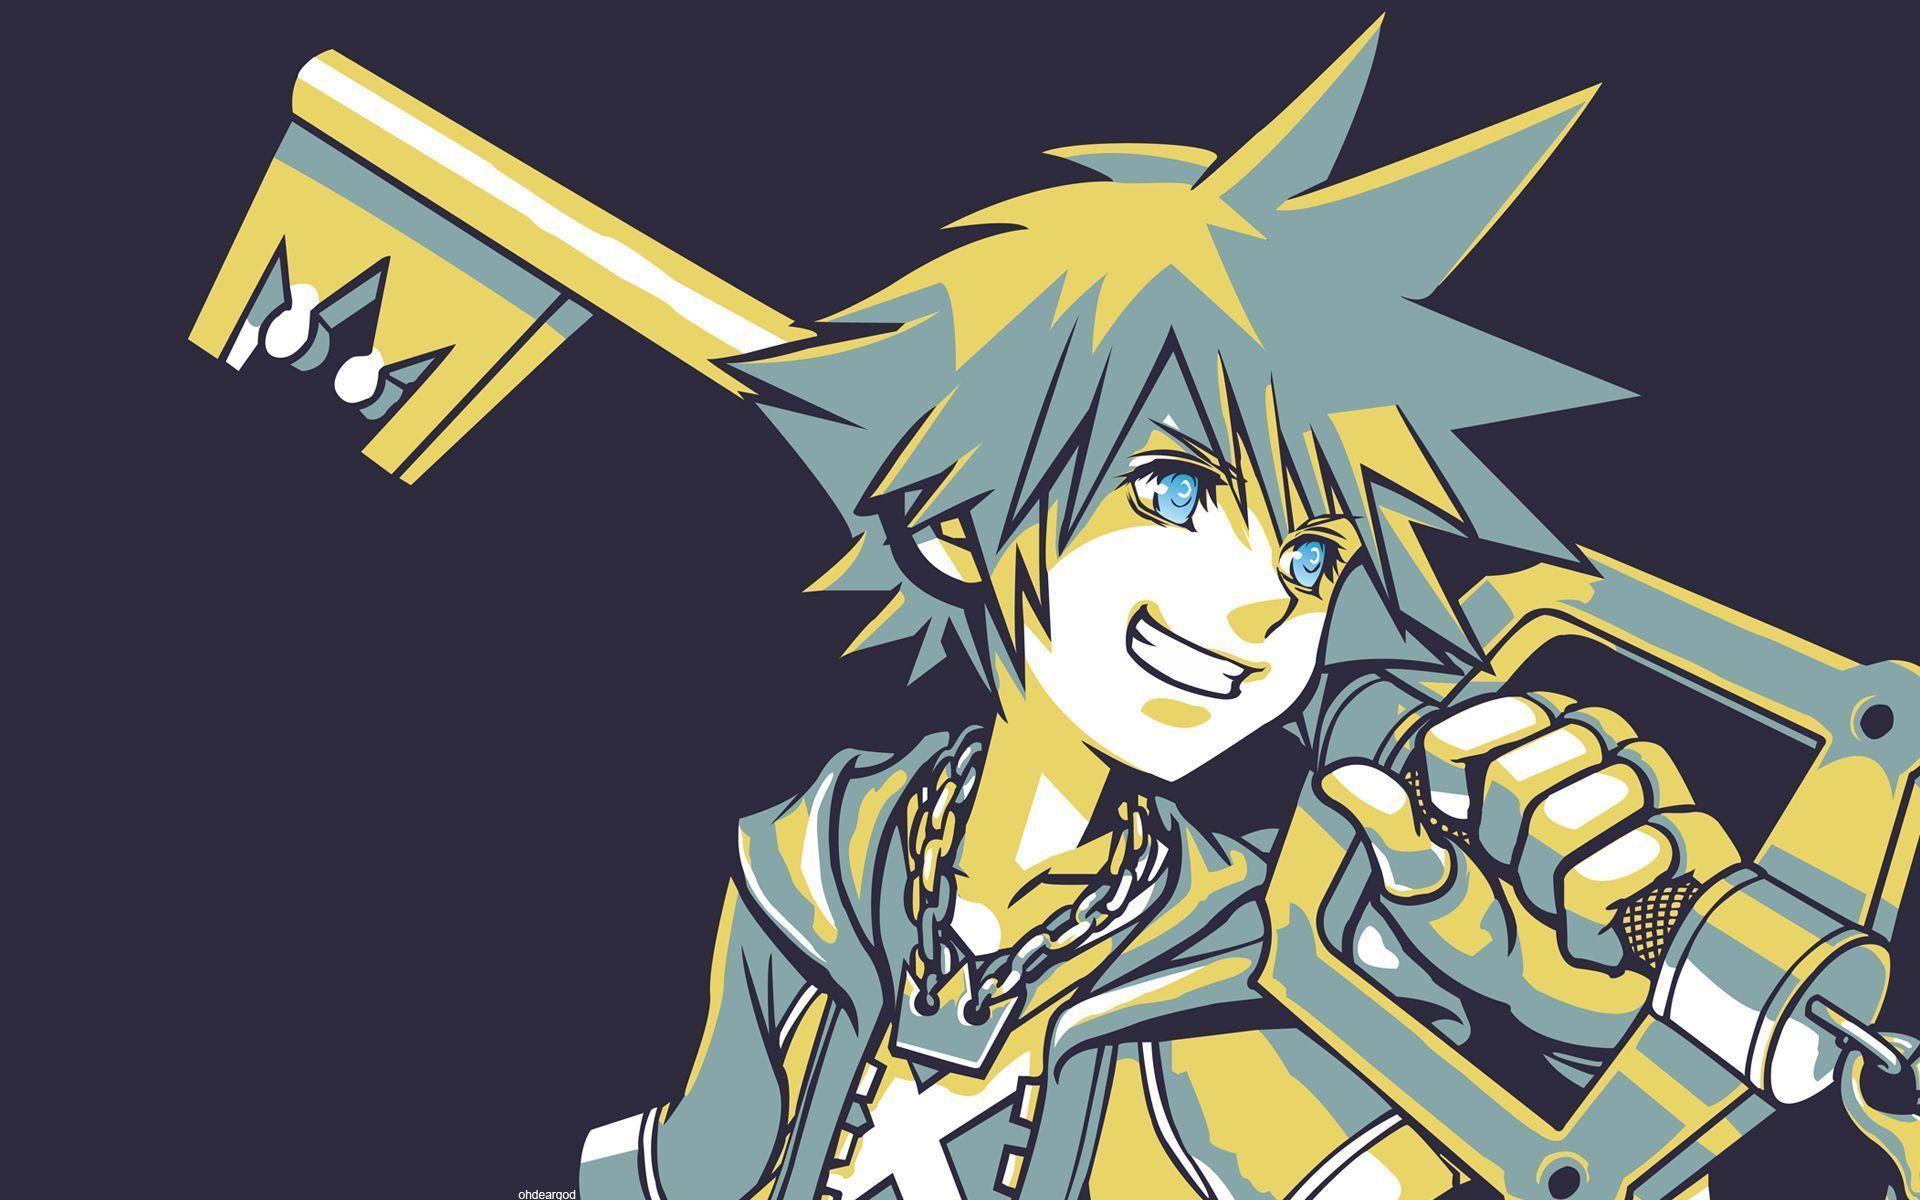 Kingdom Hearts Sora Wallpapers Top Free Kingdom Hearts